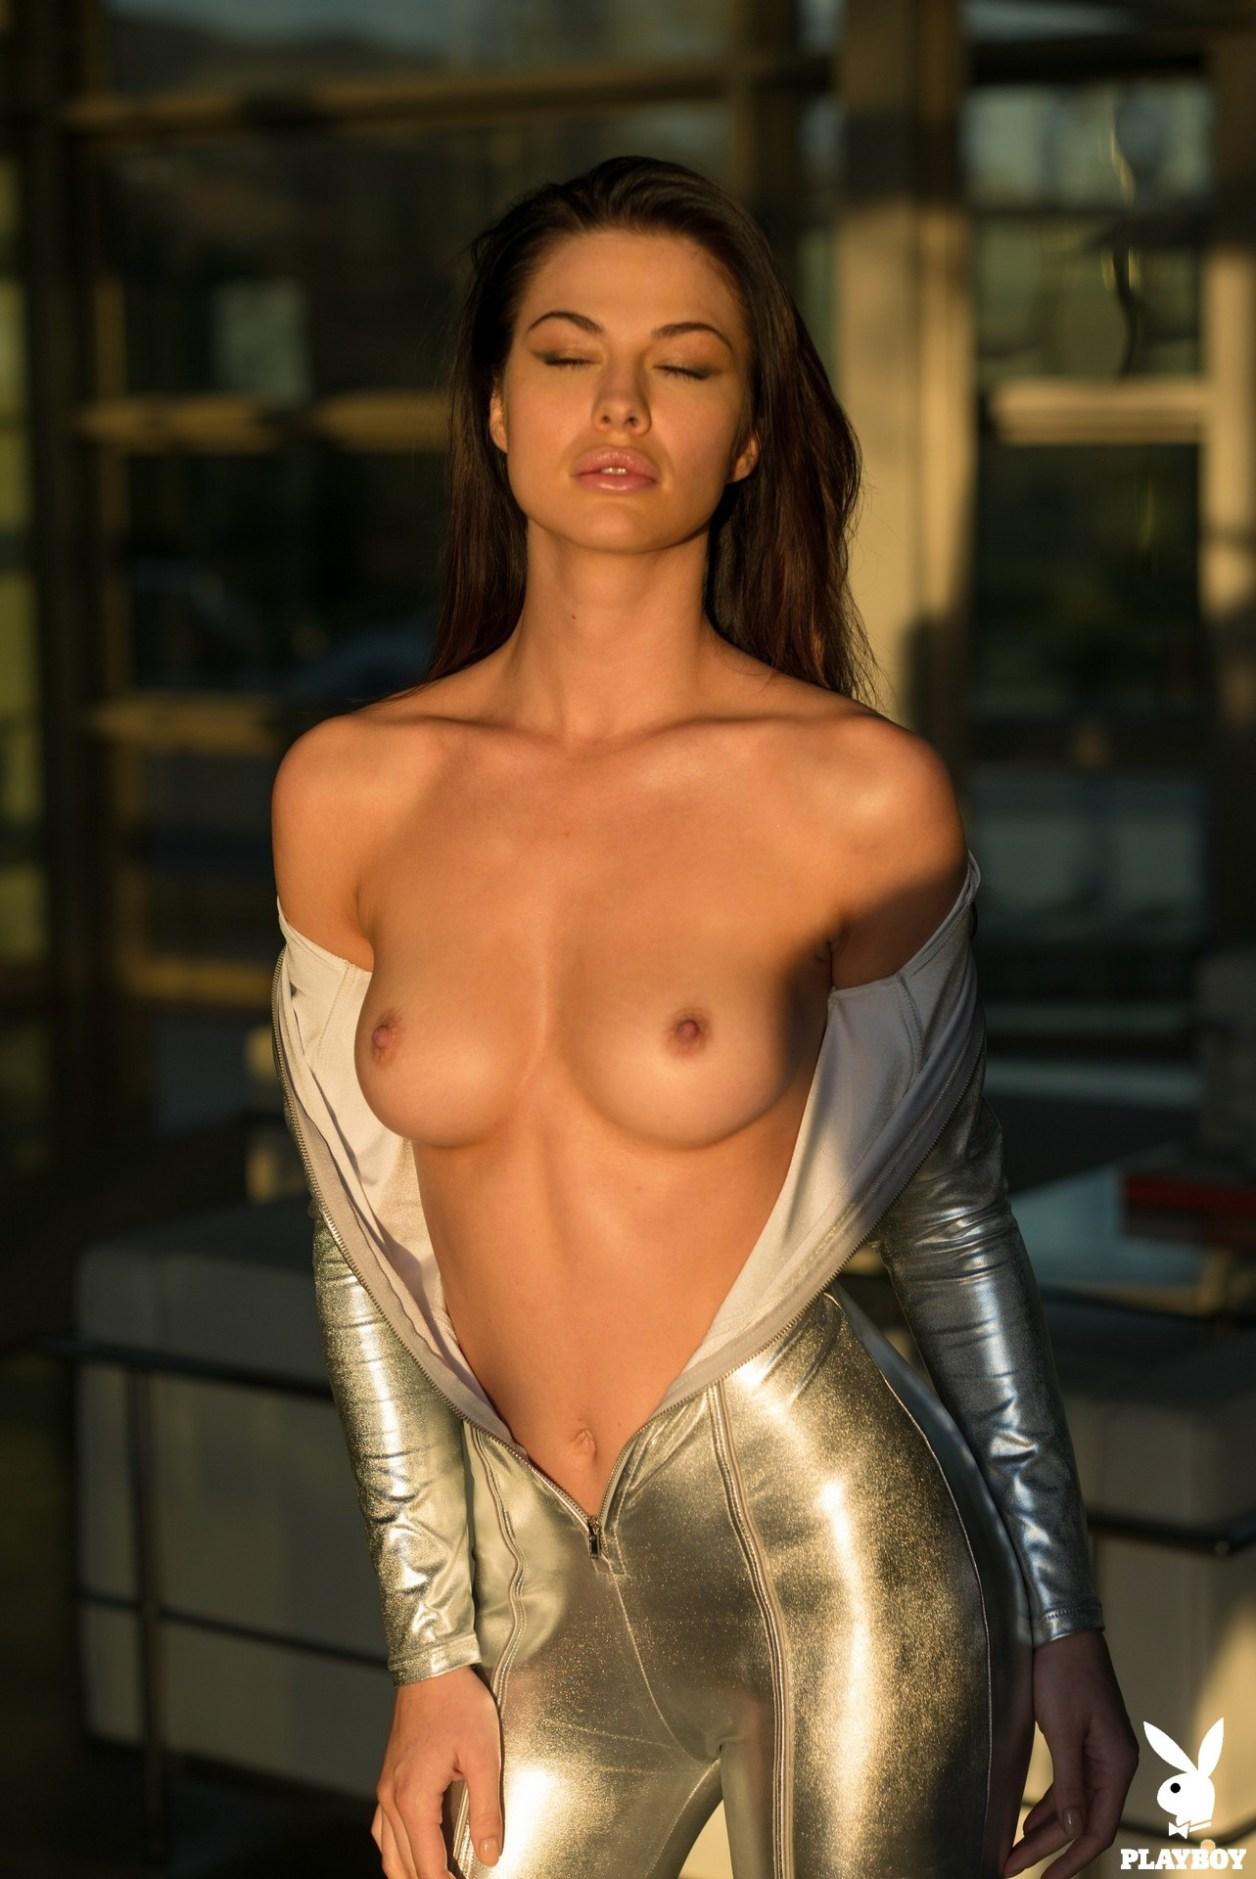 [Playboy plus] Jenny Watwood Playmate March 2018 JWatwoodpm-0016